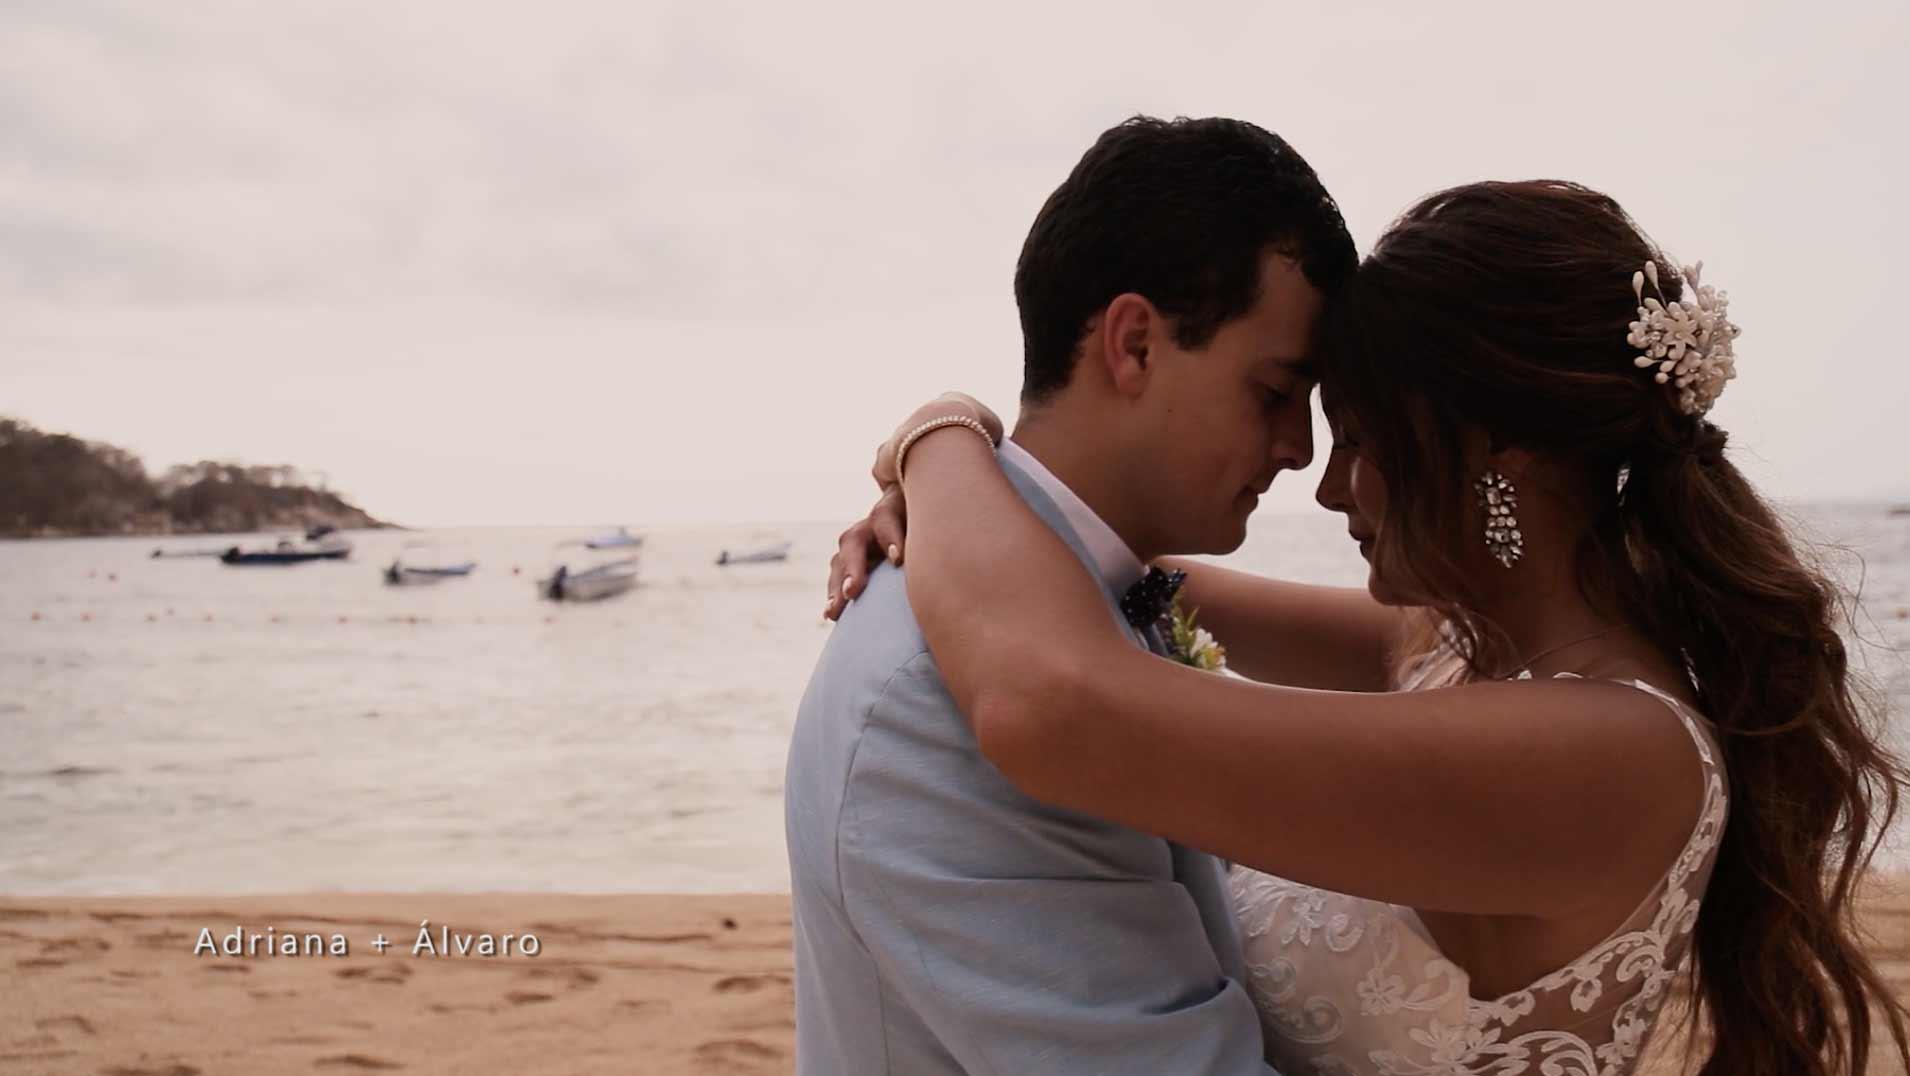 Adriana + Alvaro